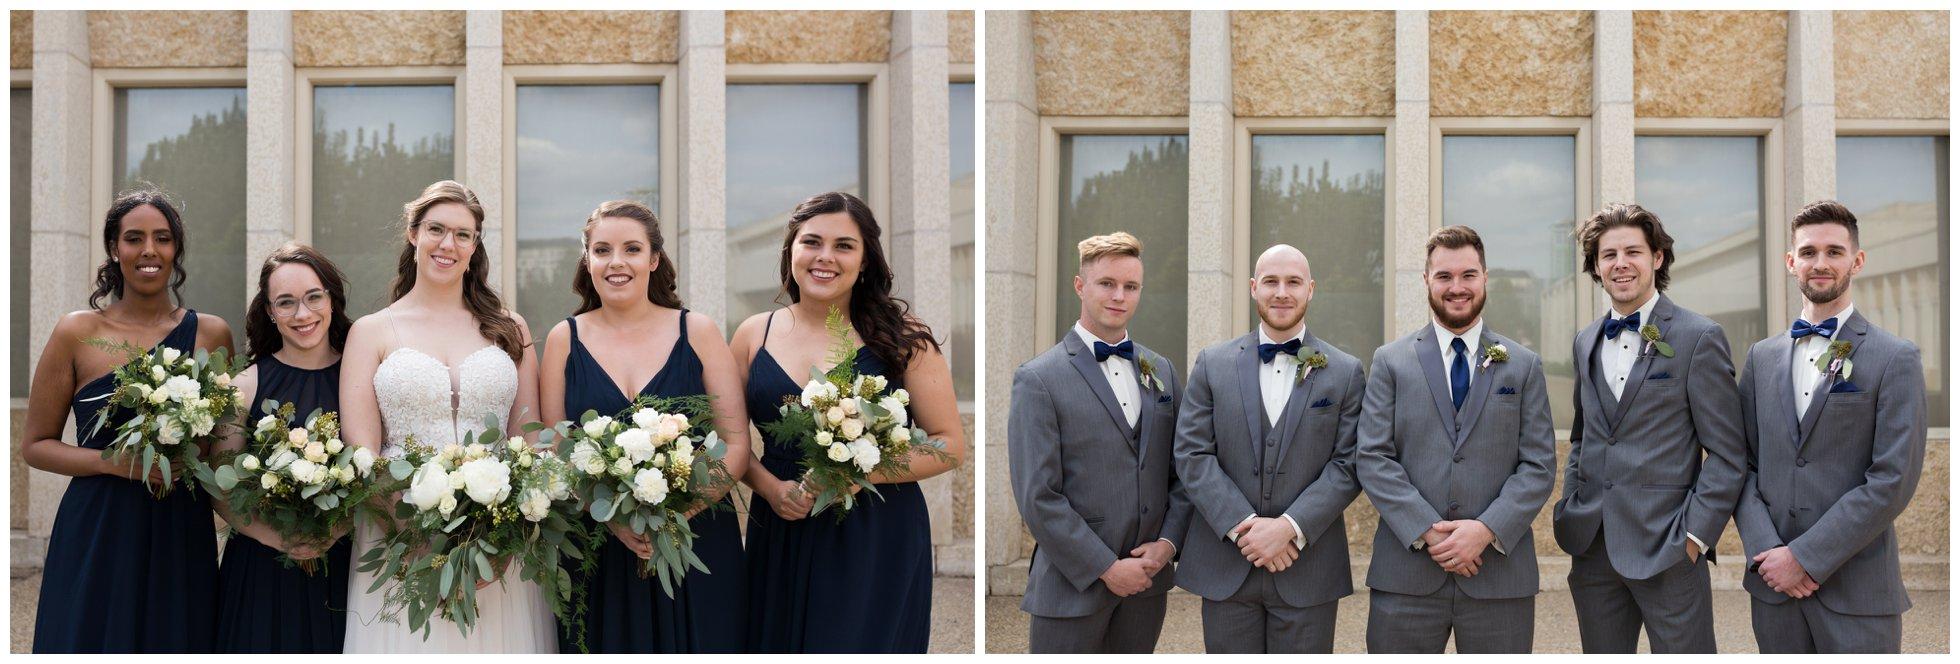 Emily and Royden Edmonton Wedding (Life by Selena Photography)_0035.jpg